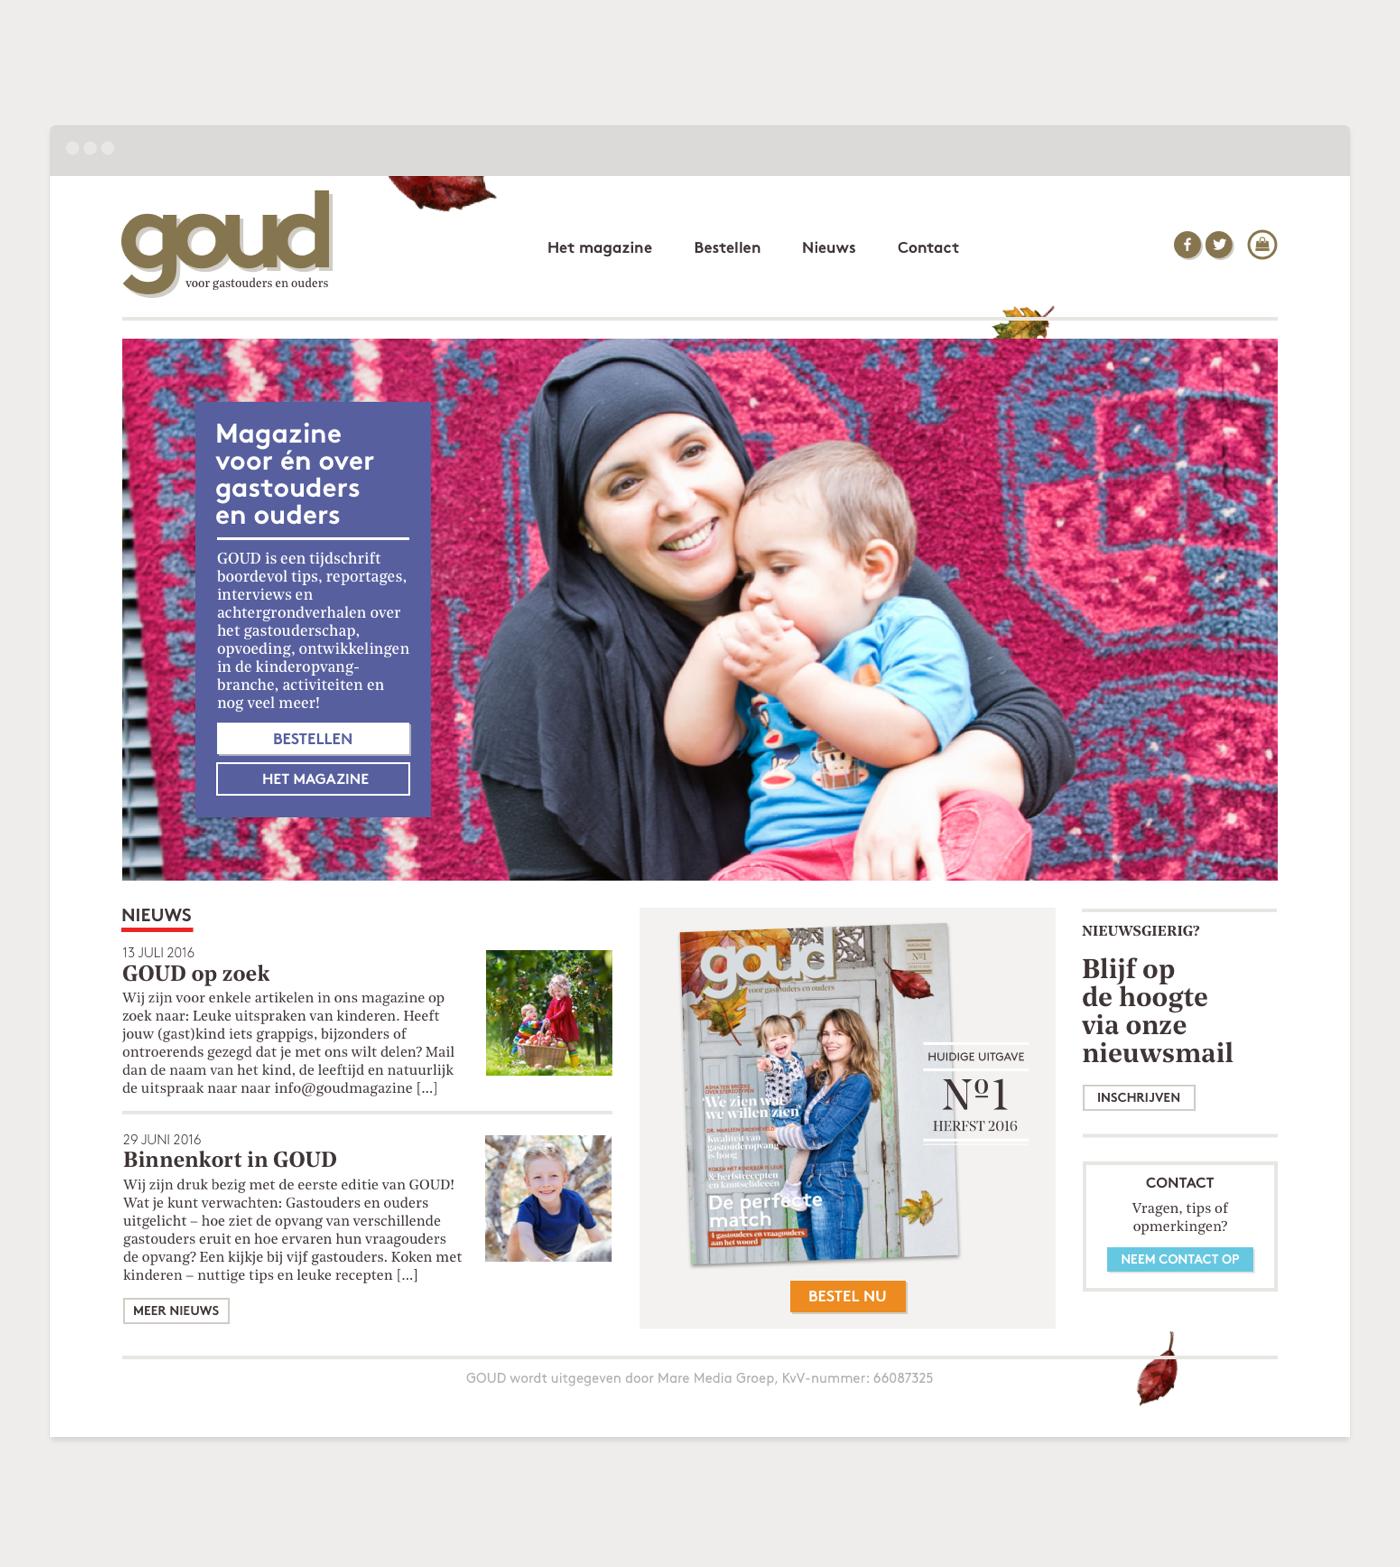 goud-magazine-desktop